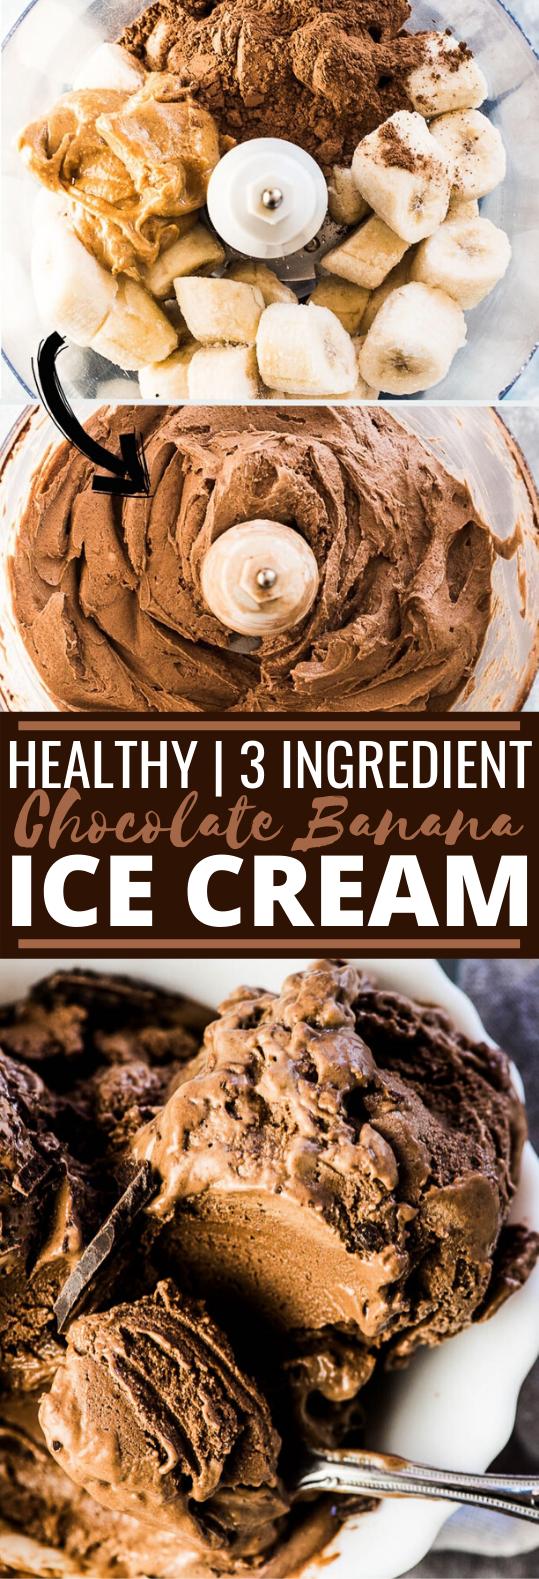 Healthy 3 Ingredient Chocolate Banana Ice Cream #healthy #recipes #icecream #glutenfree #chocolate